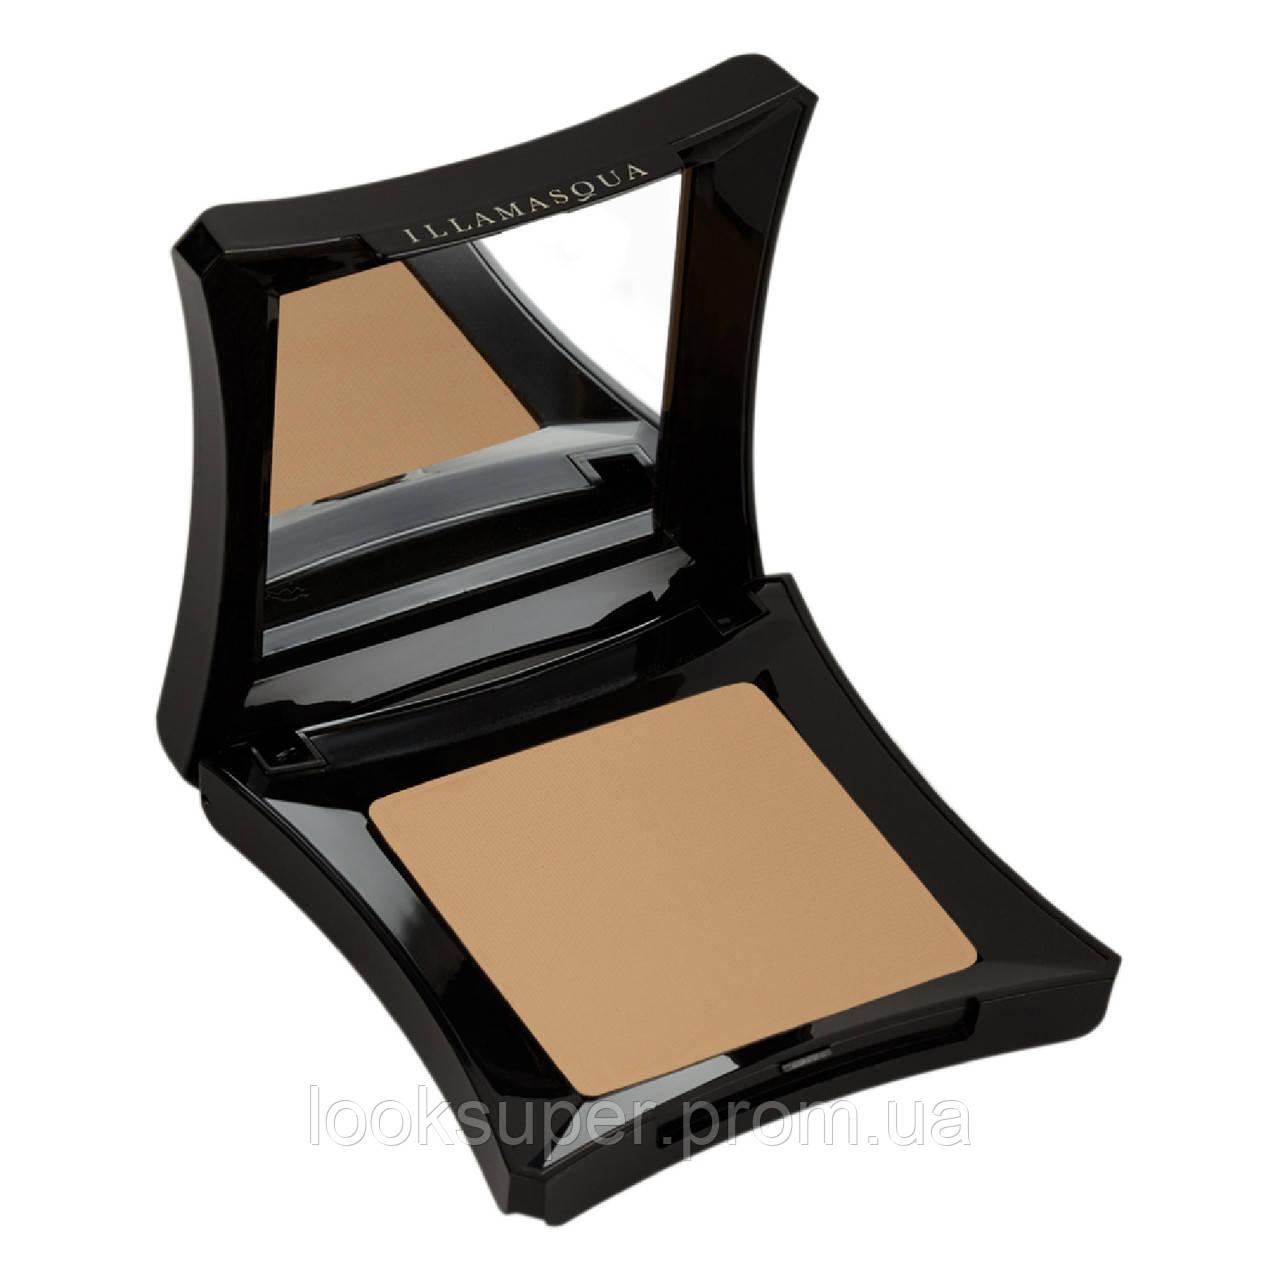 Пудра основа под макияж Illamasqua POWDER FOUNDATION  200